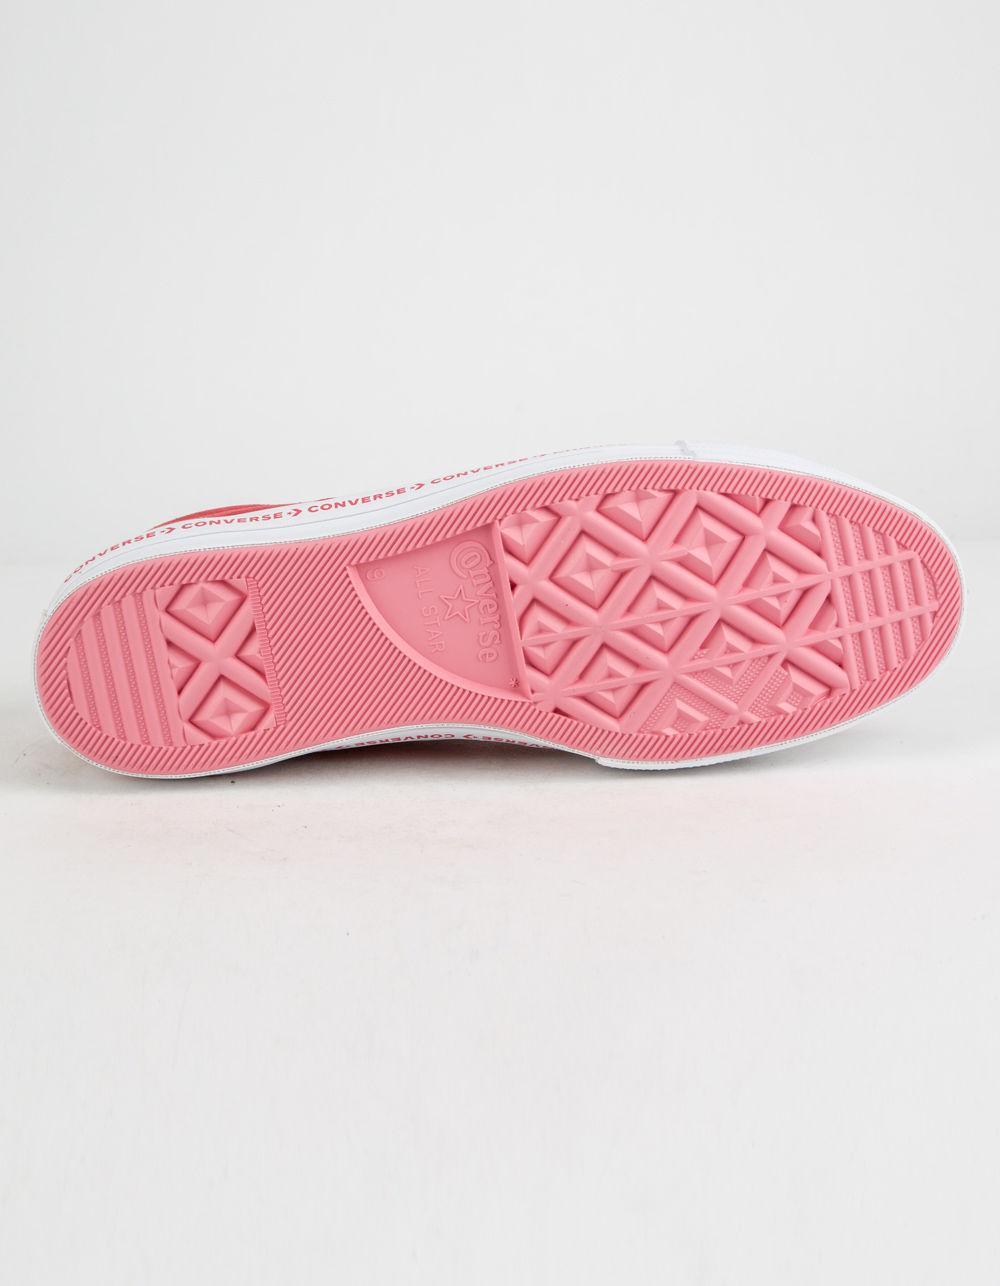 77bd112d6c4e Converse - One Star Pinstripe Paradise Pink   Geranium Pink Mens Shoes for  Men - Lyst. View fullscreen